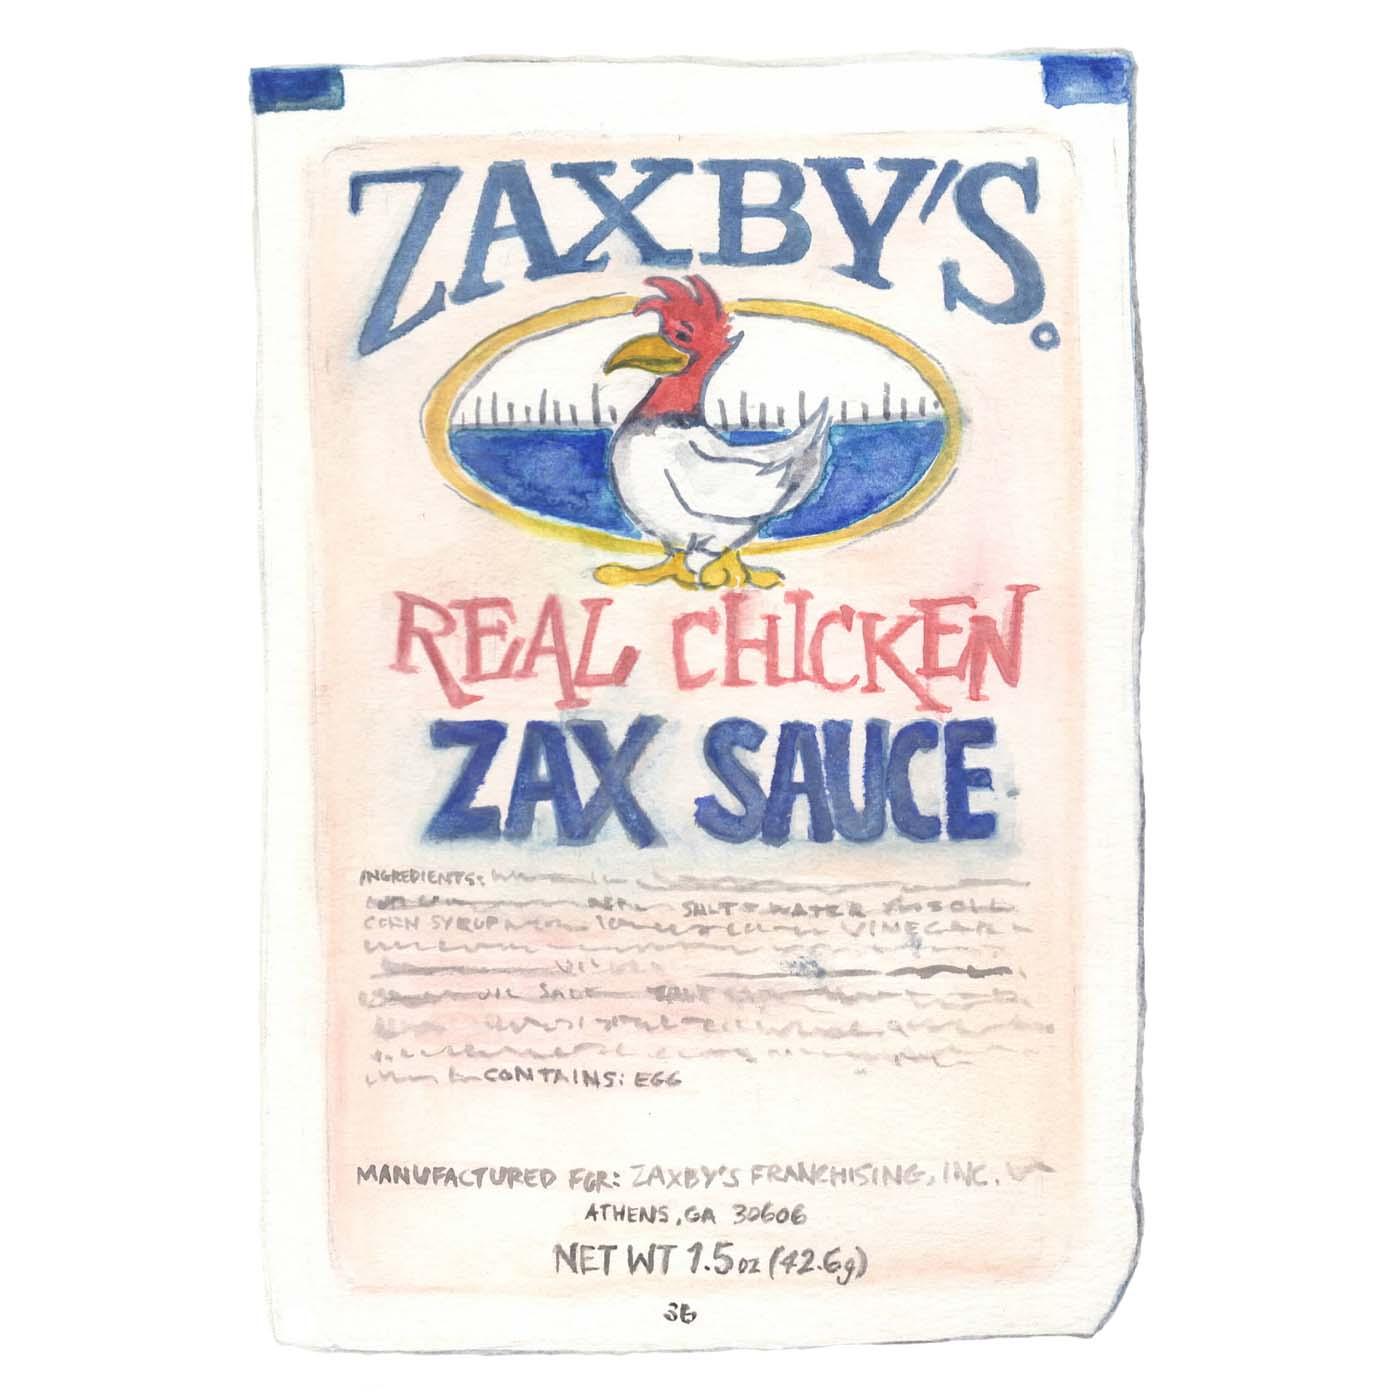 Condimental_Zaxbys_Sauce_Edit.jpg